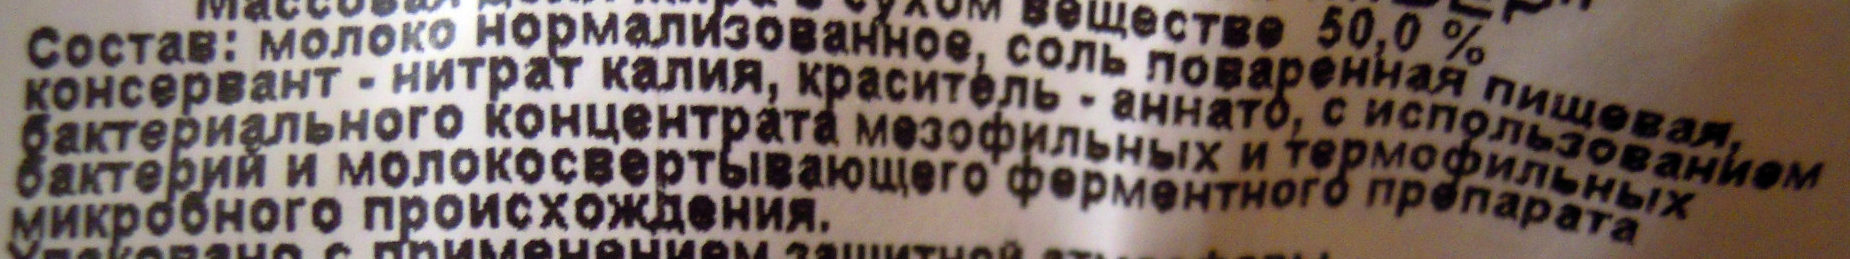 Сыр Ламбер - Ingrédients - ru